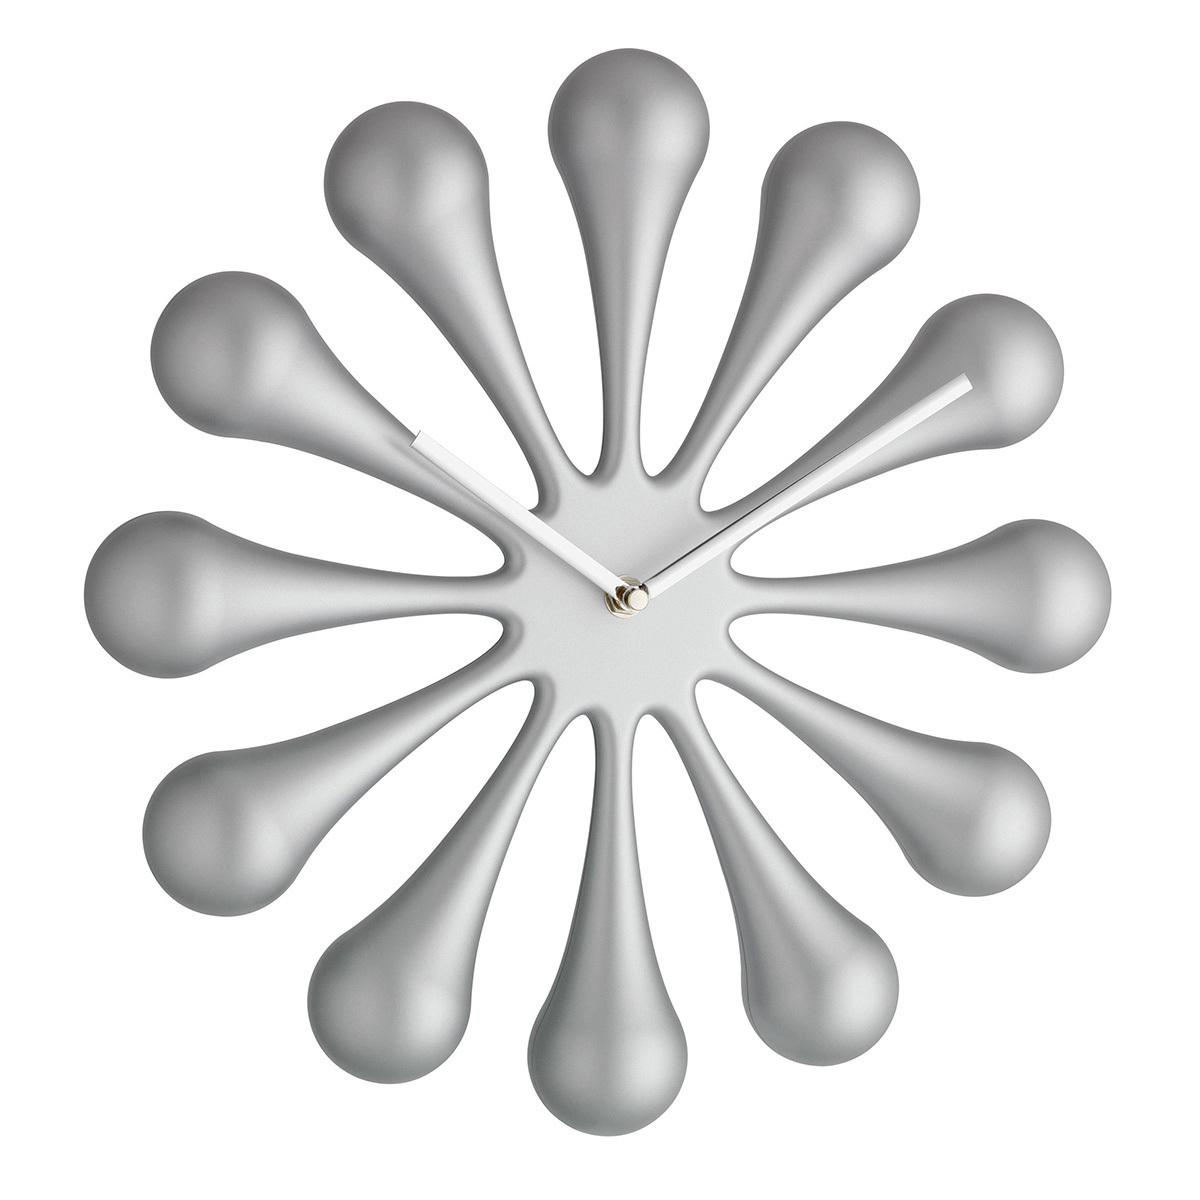 60-3008-analoge-design-wanduhr-astro-1200x1200px.jpg